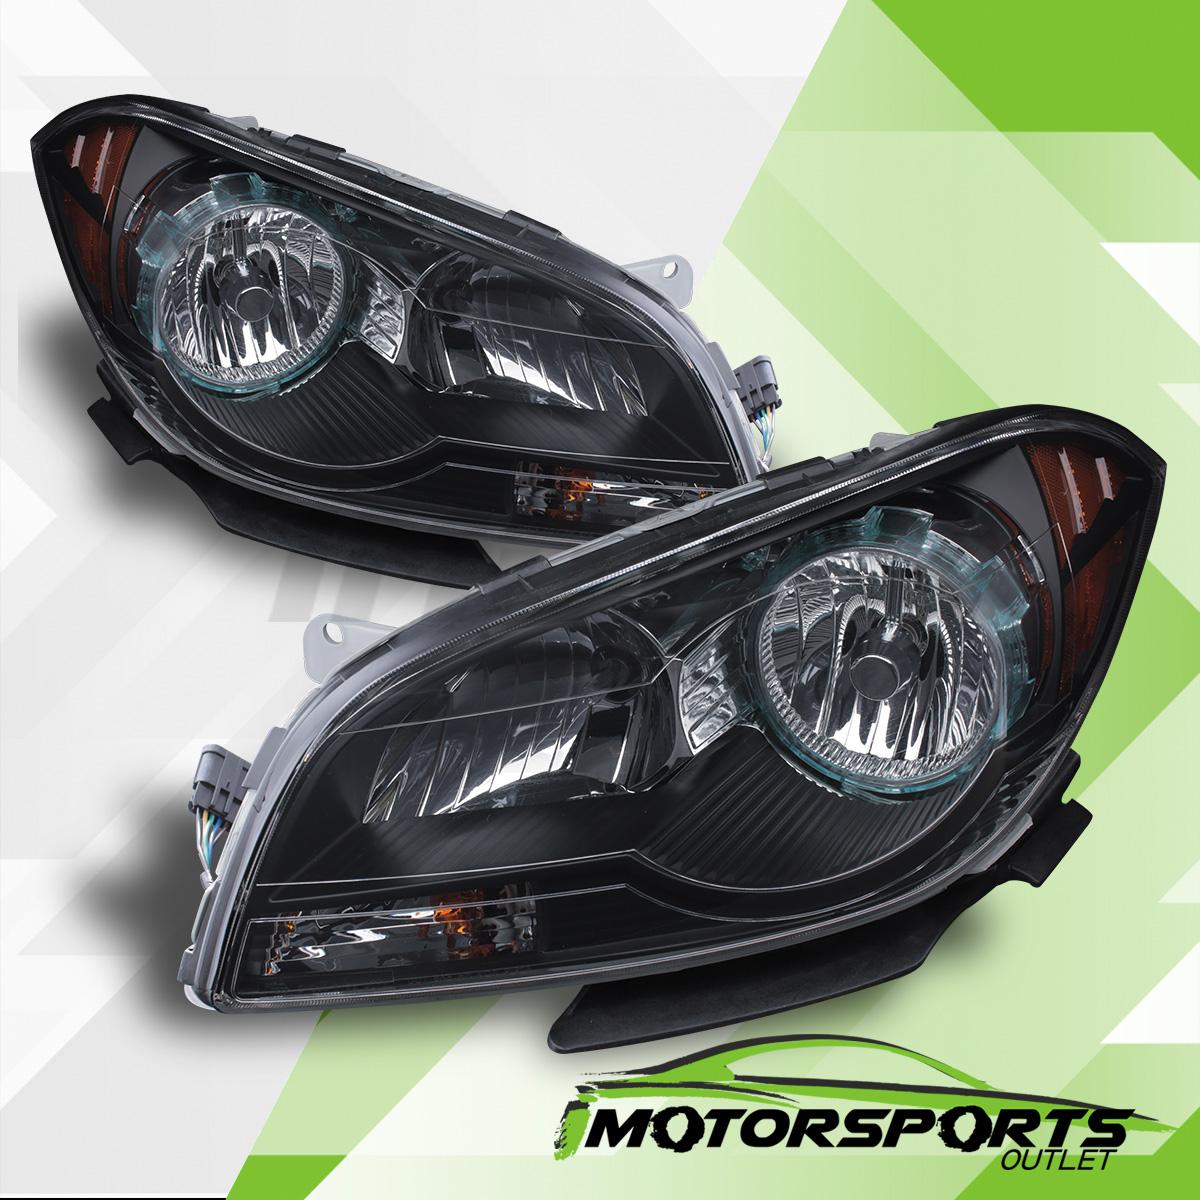 Chevy Malibu Front Lights: 2008 2009 2010 2011 2012 Chevy Malibu Factory Style Black